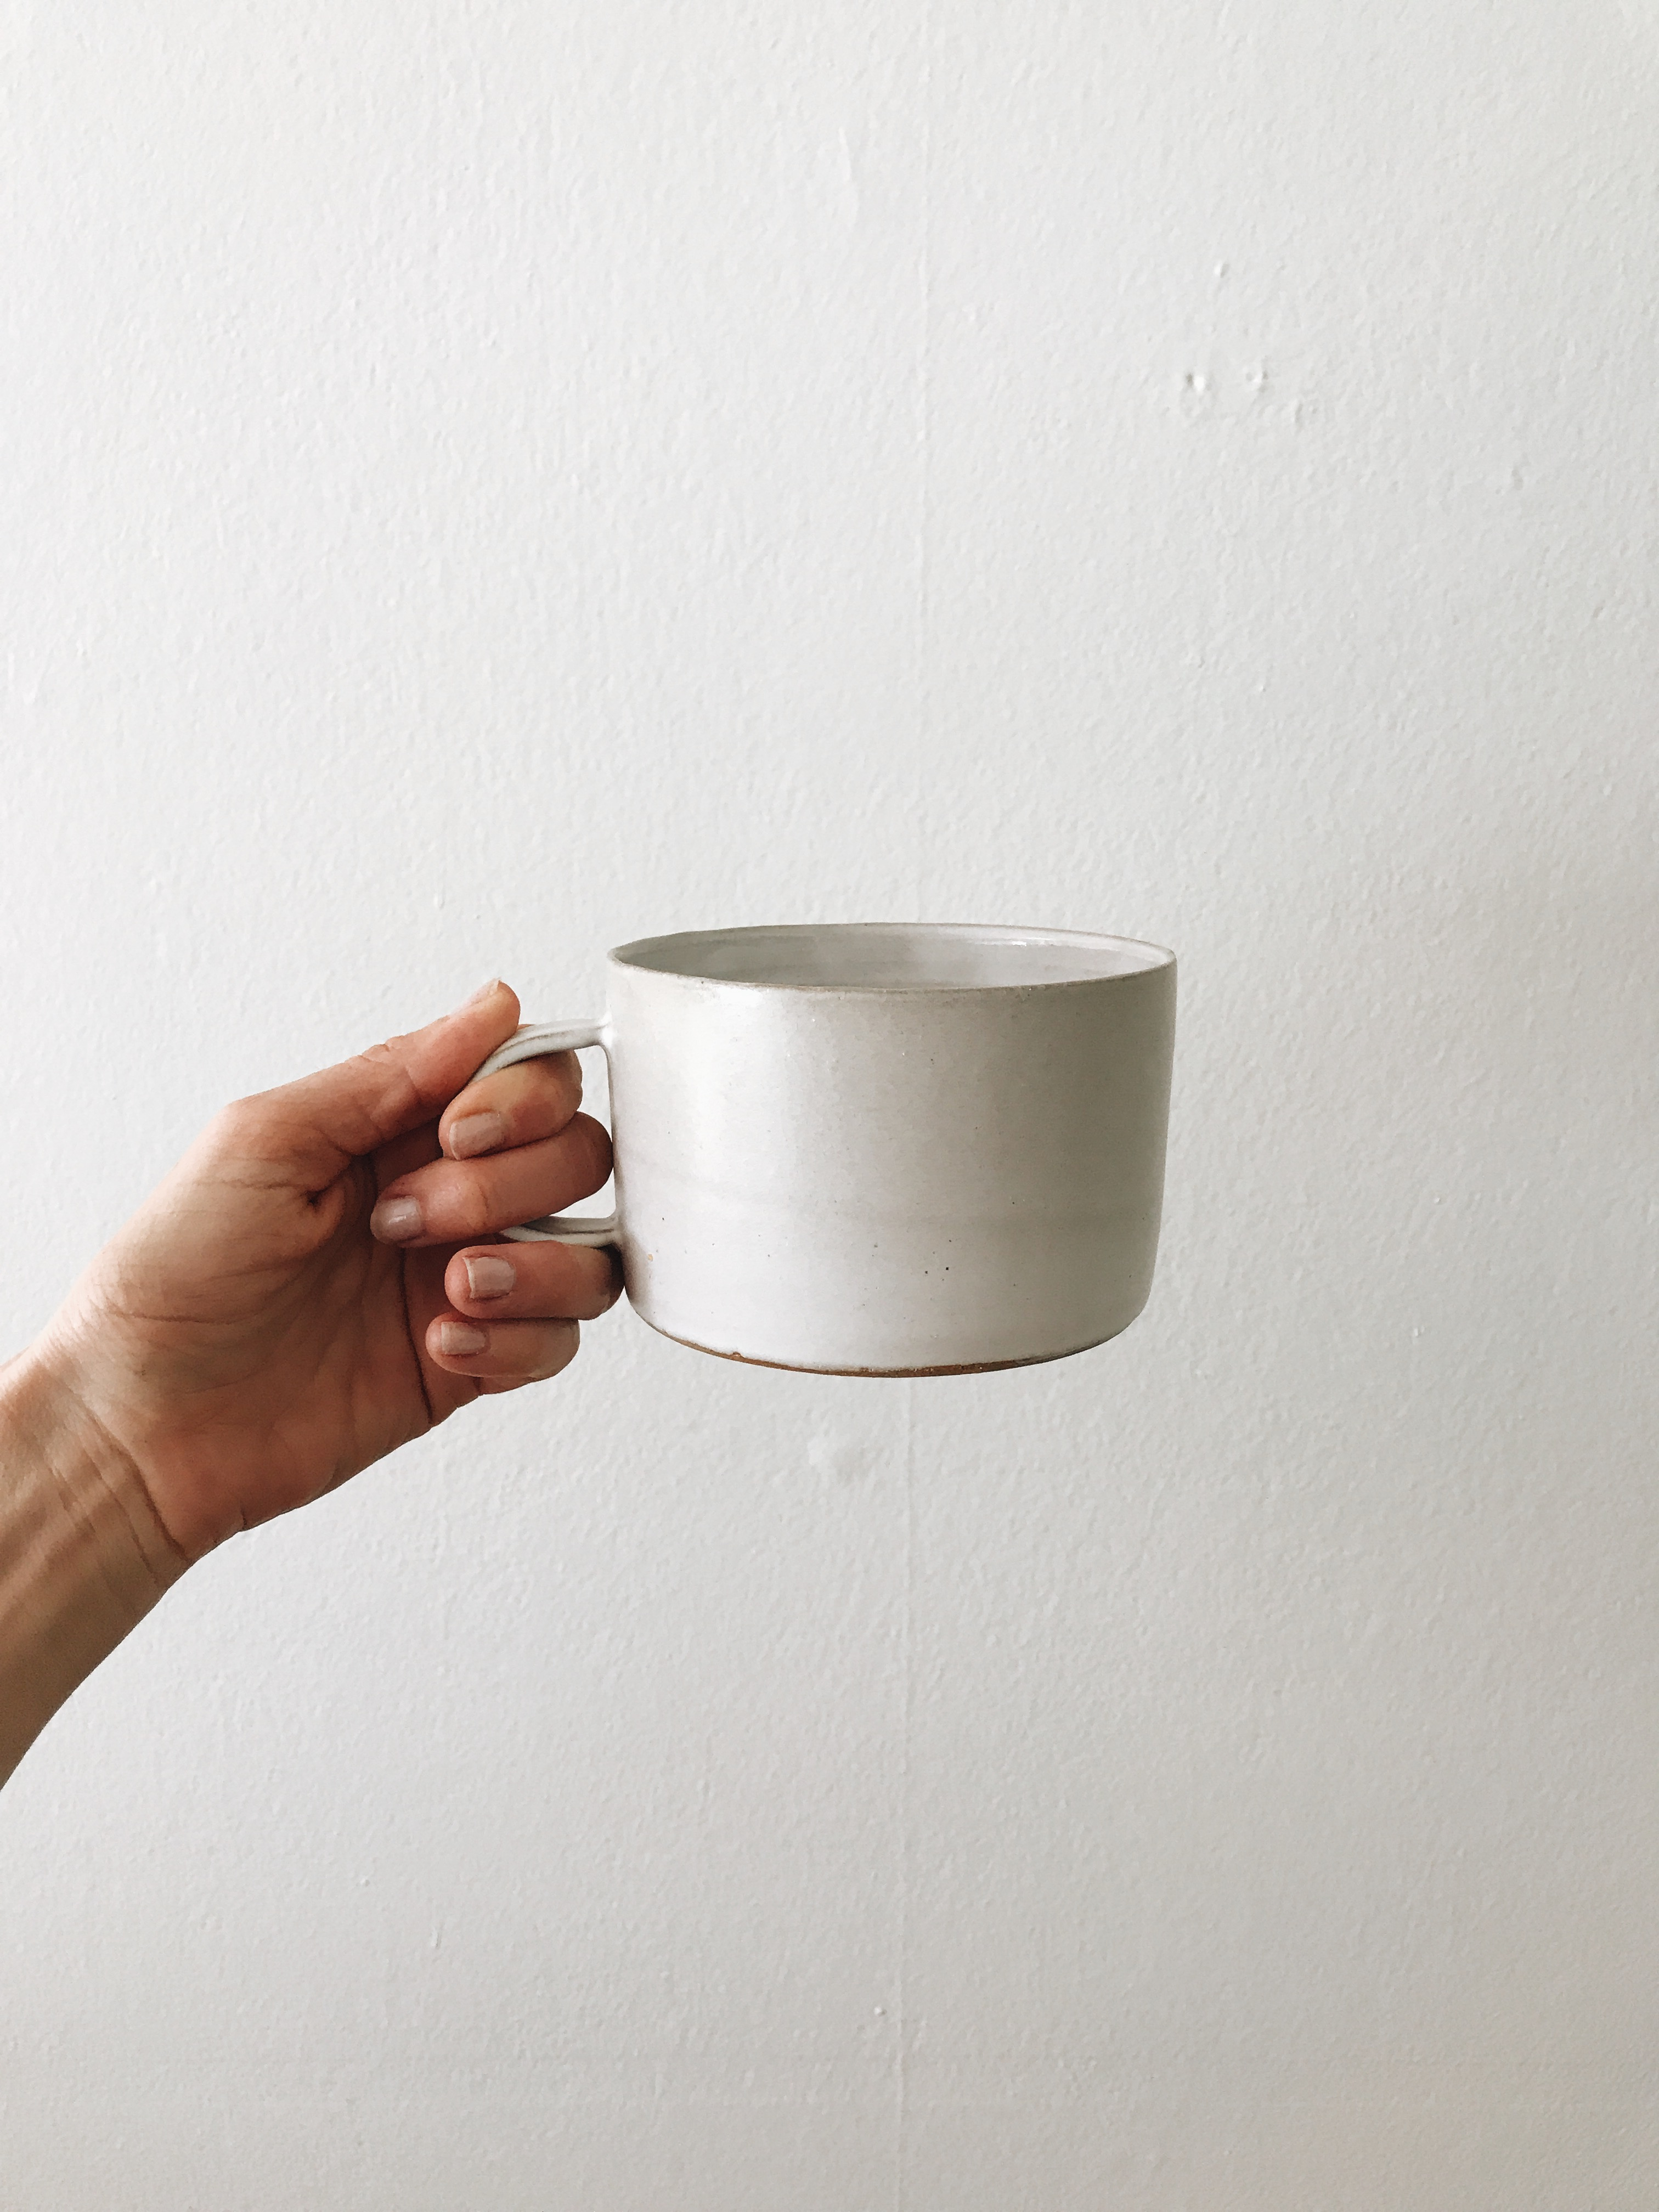 Mug by Tracie Hervy